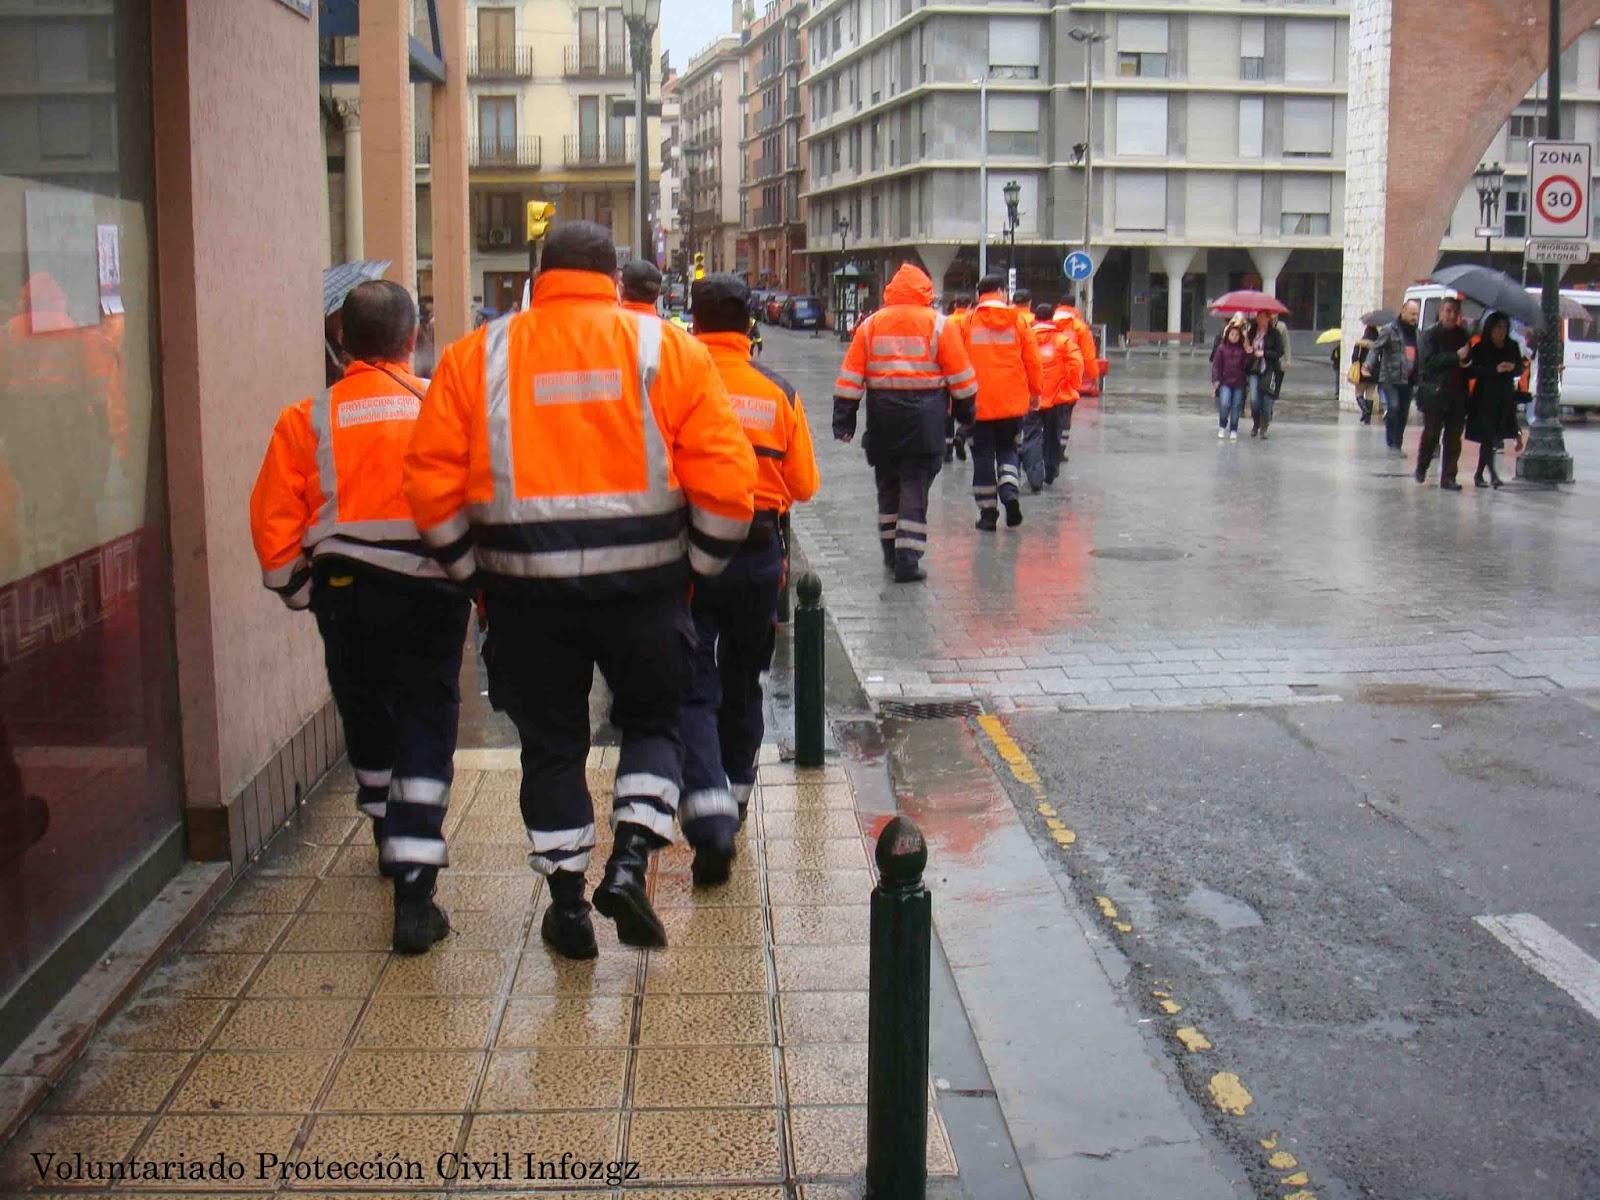 Voluntariado protecci n civil infozgz 05 01 13 - Tiempo en casetas zaragoza ...